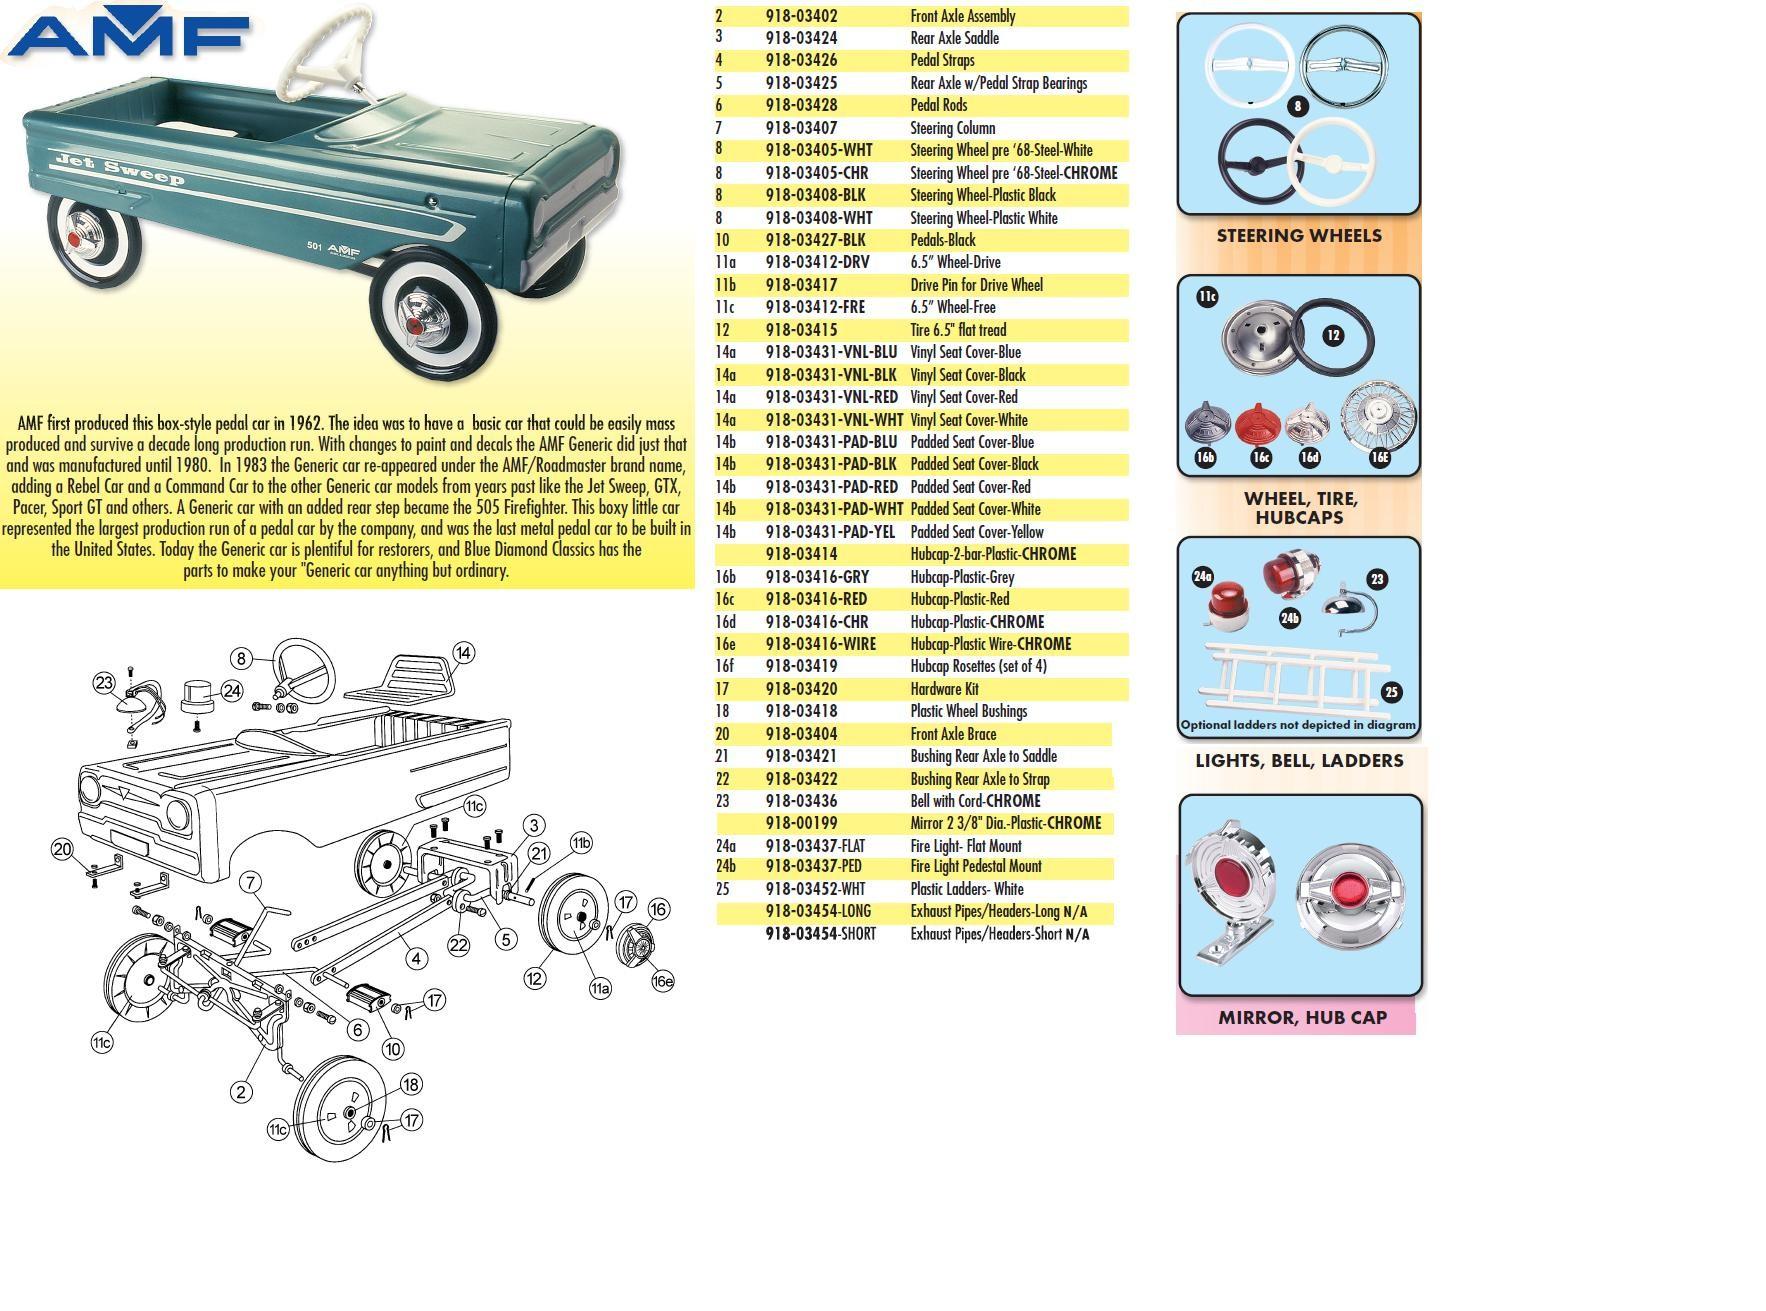 Car Wheel and Axle Diagram 6 5 Inch Pedal Car Tire Of Car Wheel and Axle Diagram